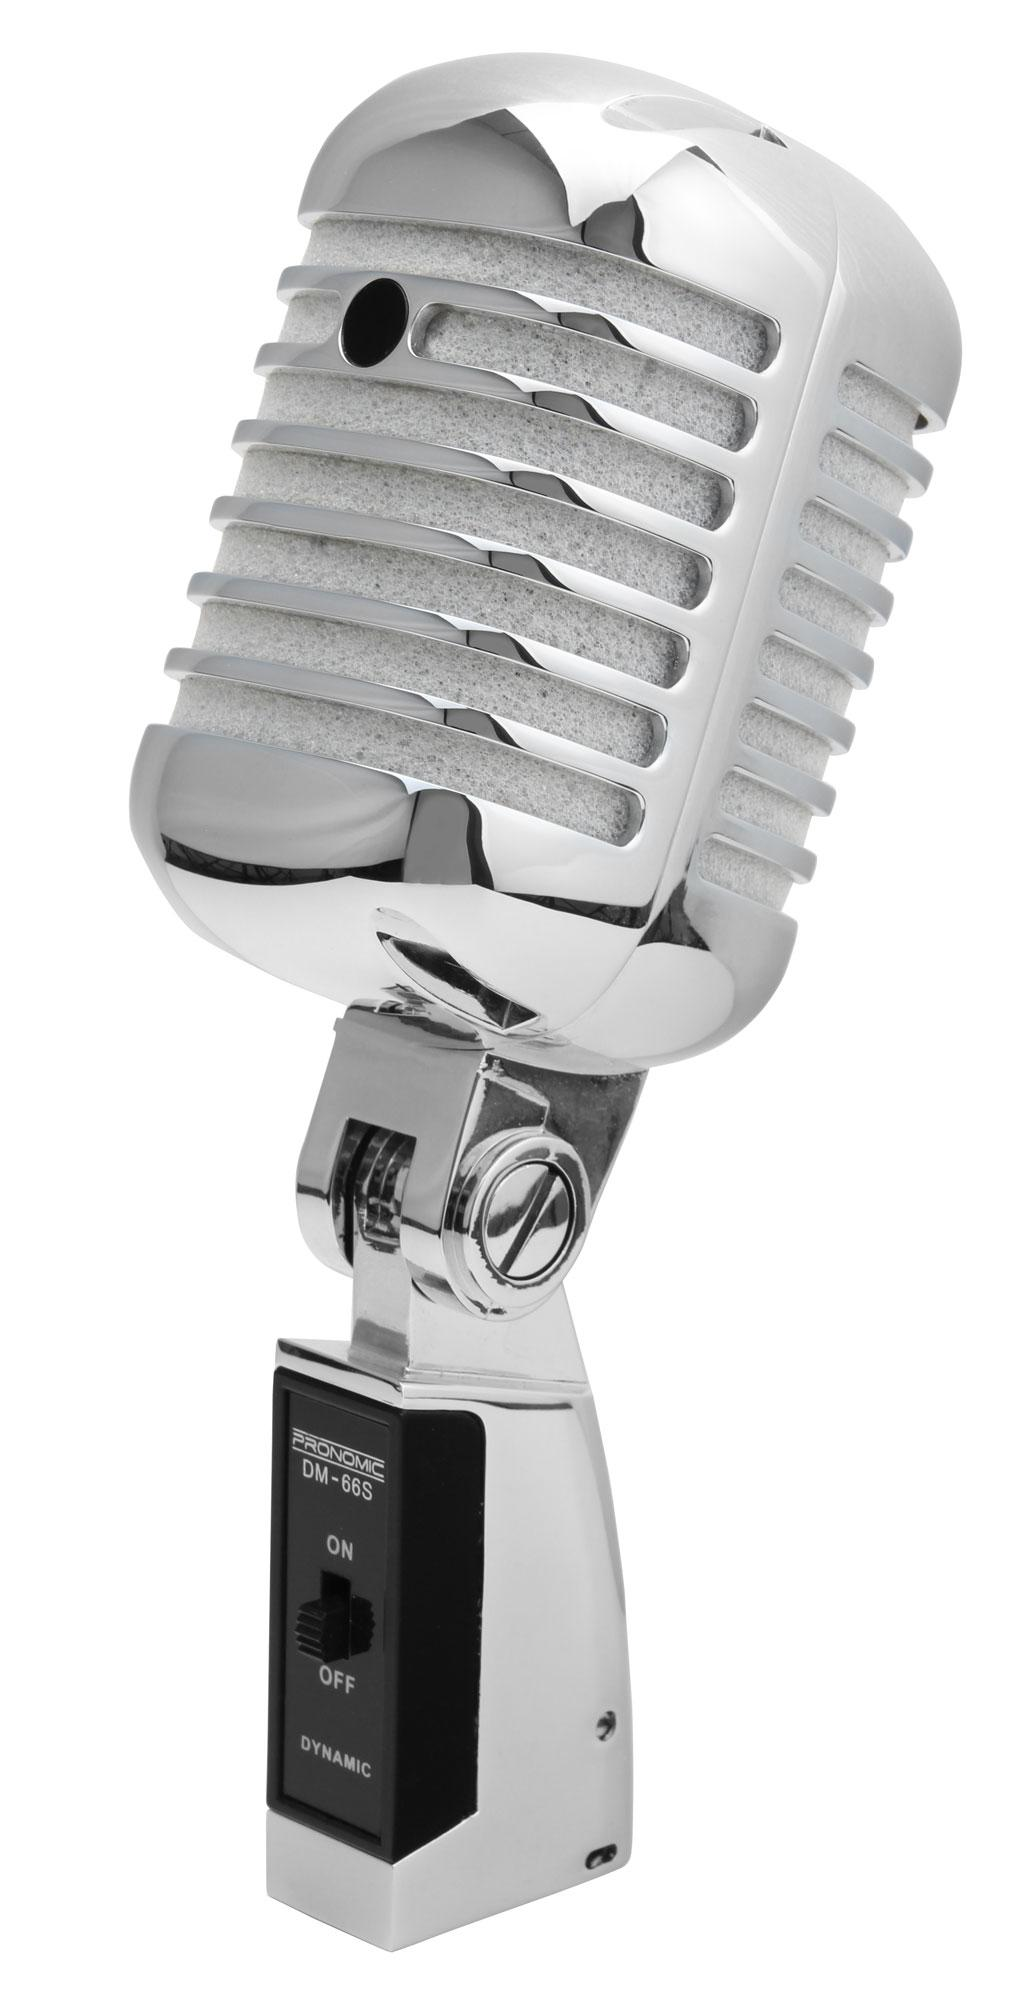 Pronomic DM 66S Elvis Dynamisches Mikrofon silber